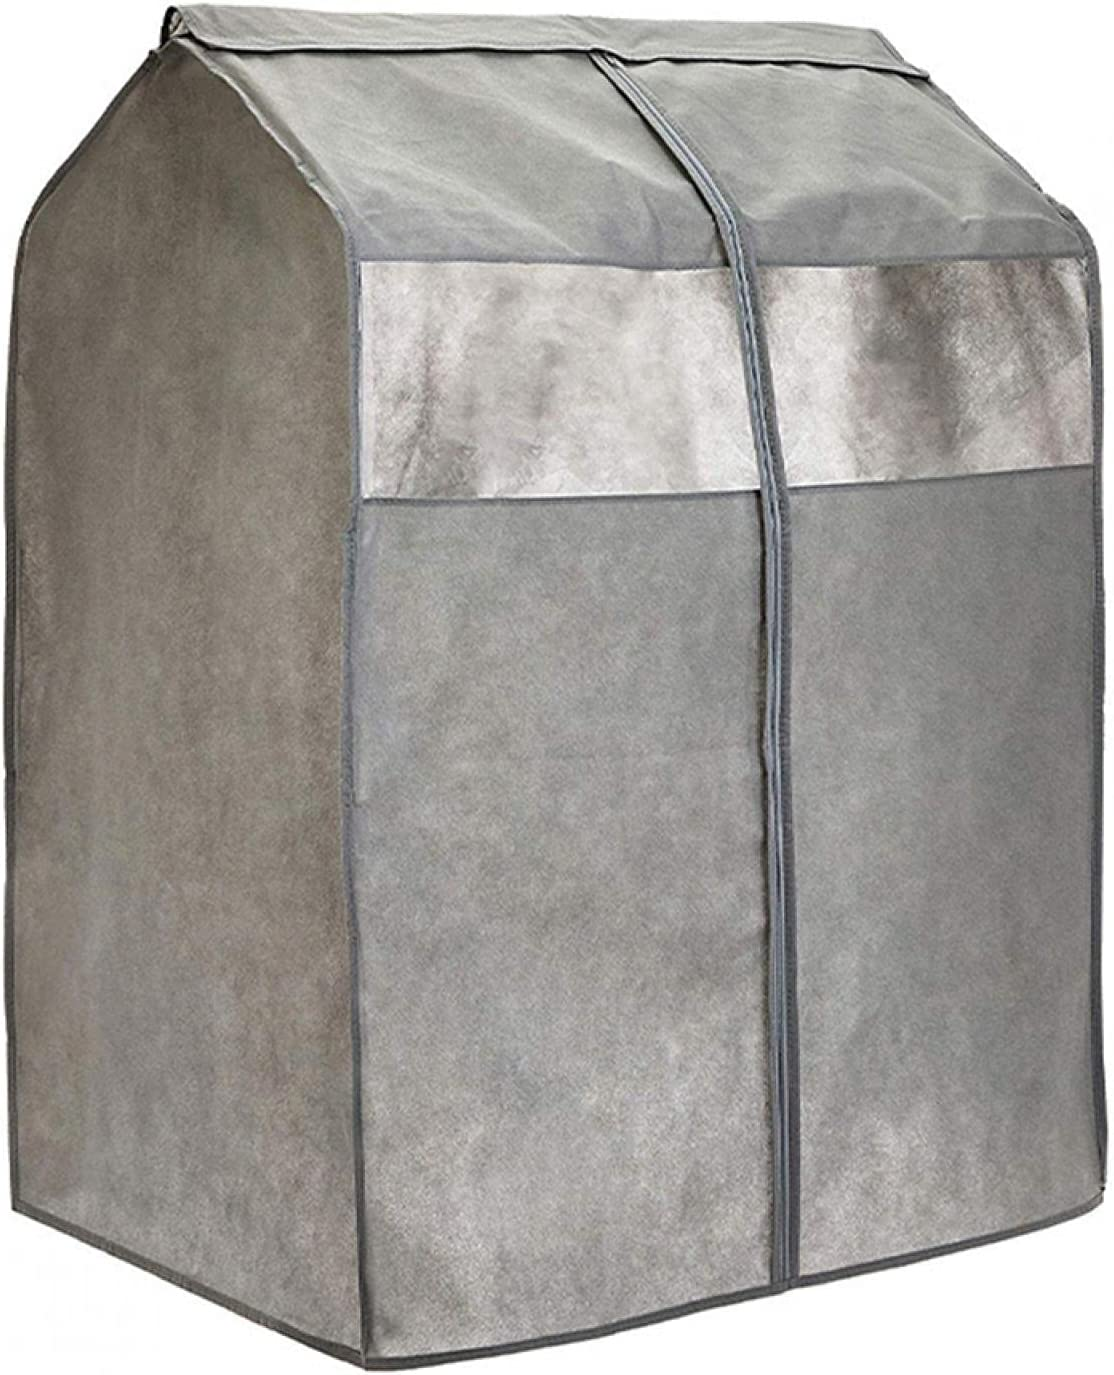 EKDJKK Garment Bag Organizer Storage with PVC OFFer Luxury Windows Garm Clear